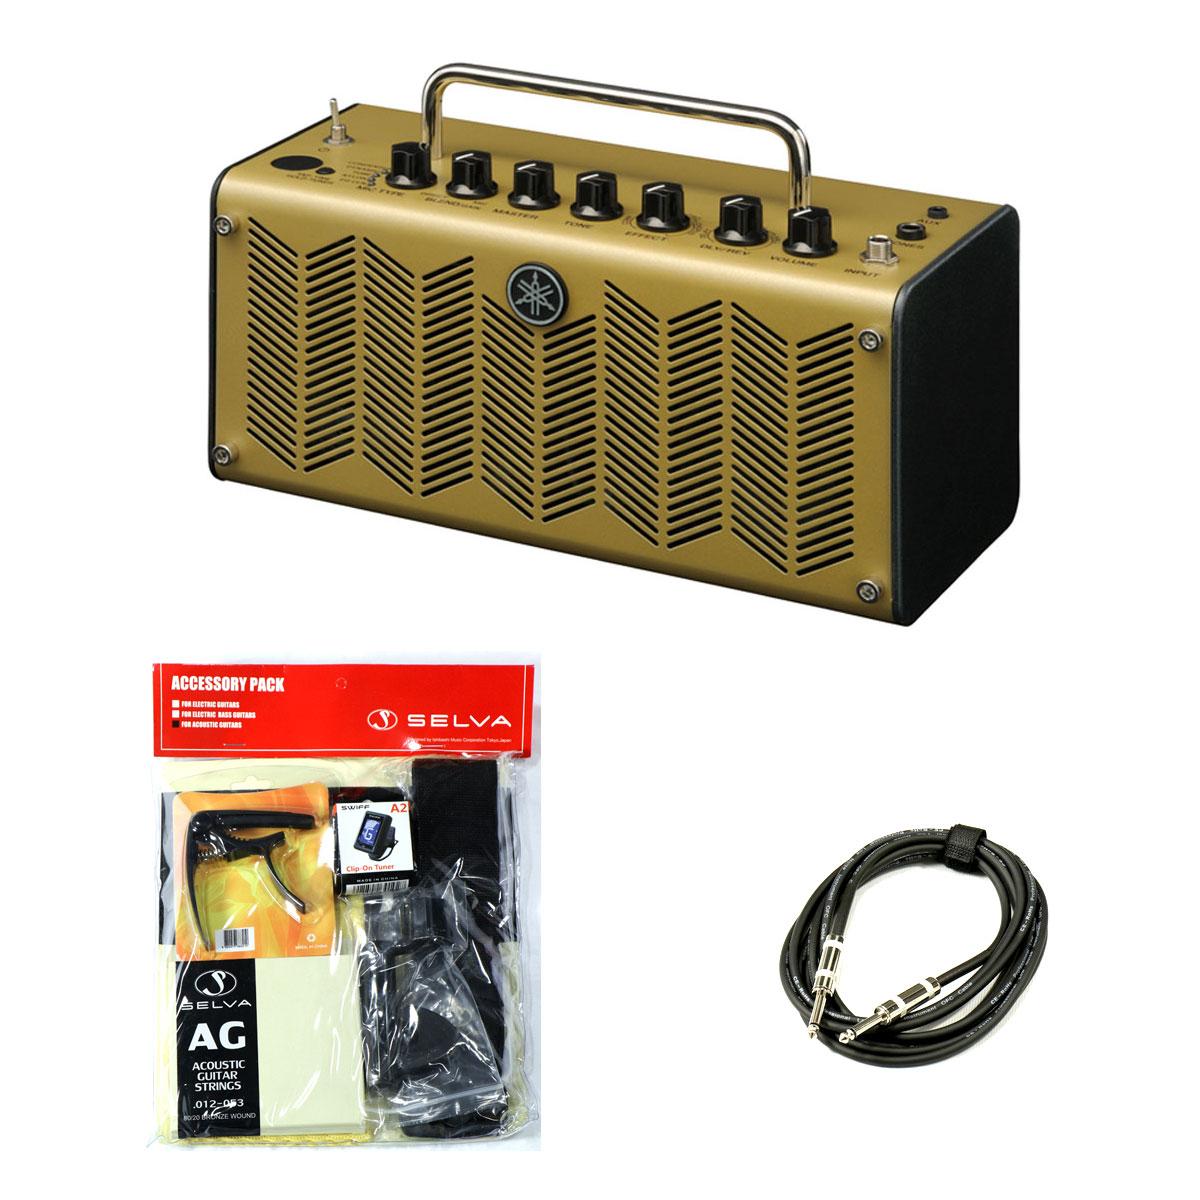 YAMAHA / THR5A Amplifier 【アコースティック用アンプスターターセット】【電池駆動可能】エレアコギターアンプ【YRK】